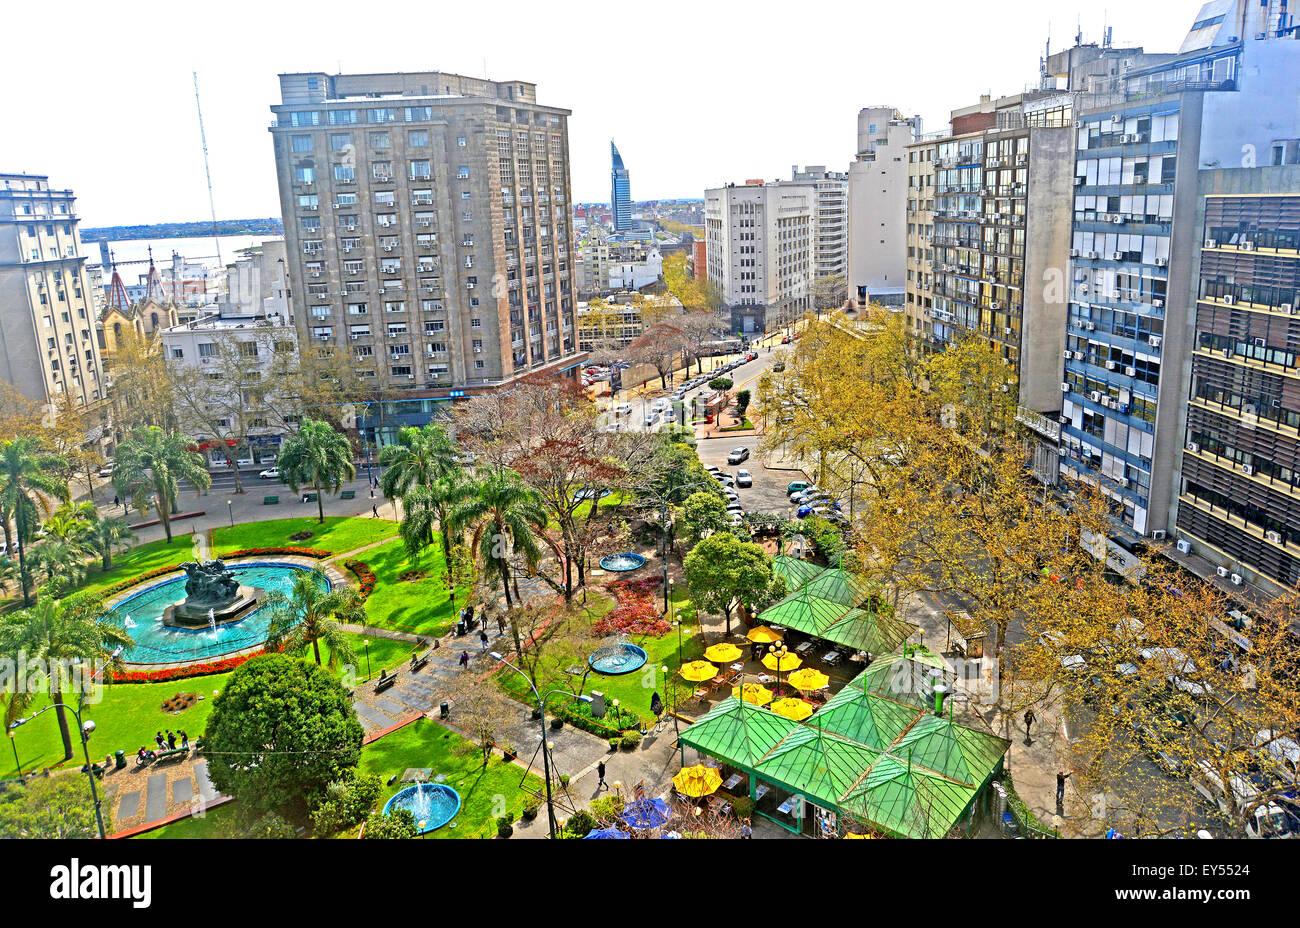 Plaza Fabini Montevideo Uruguay Immagini Stock